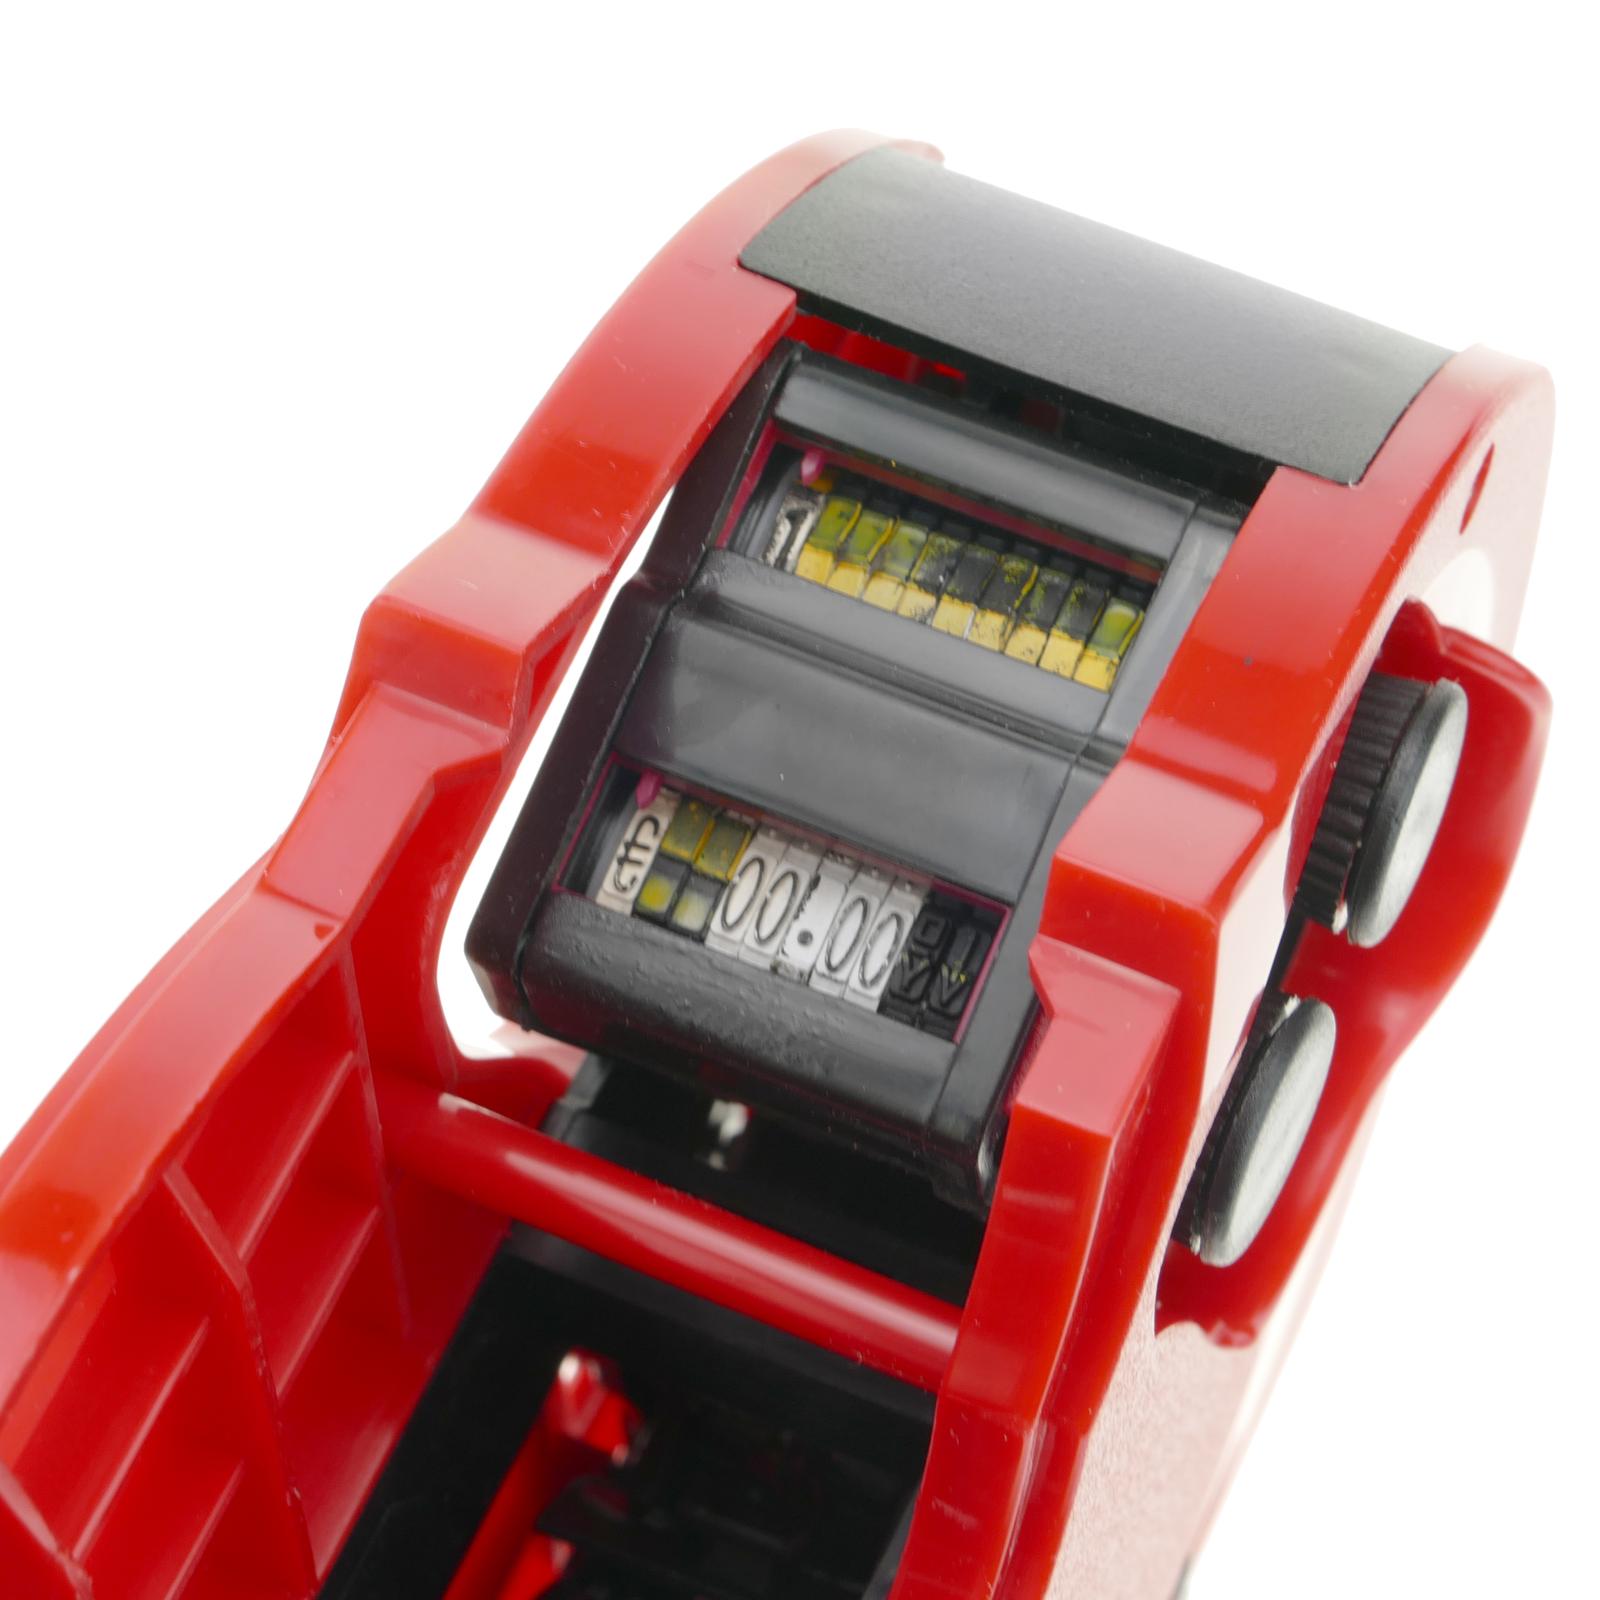 Etiquetadora Manual de Precios 2 l/íneas con 10+10 d/ígitos 23x16mm PrimeMatik